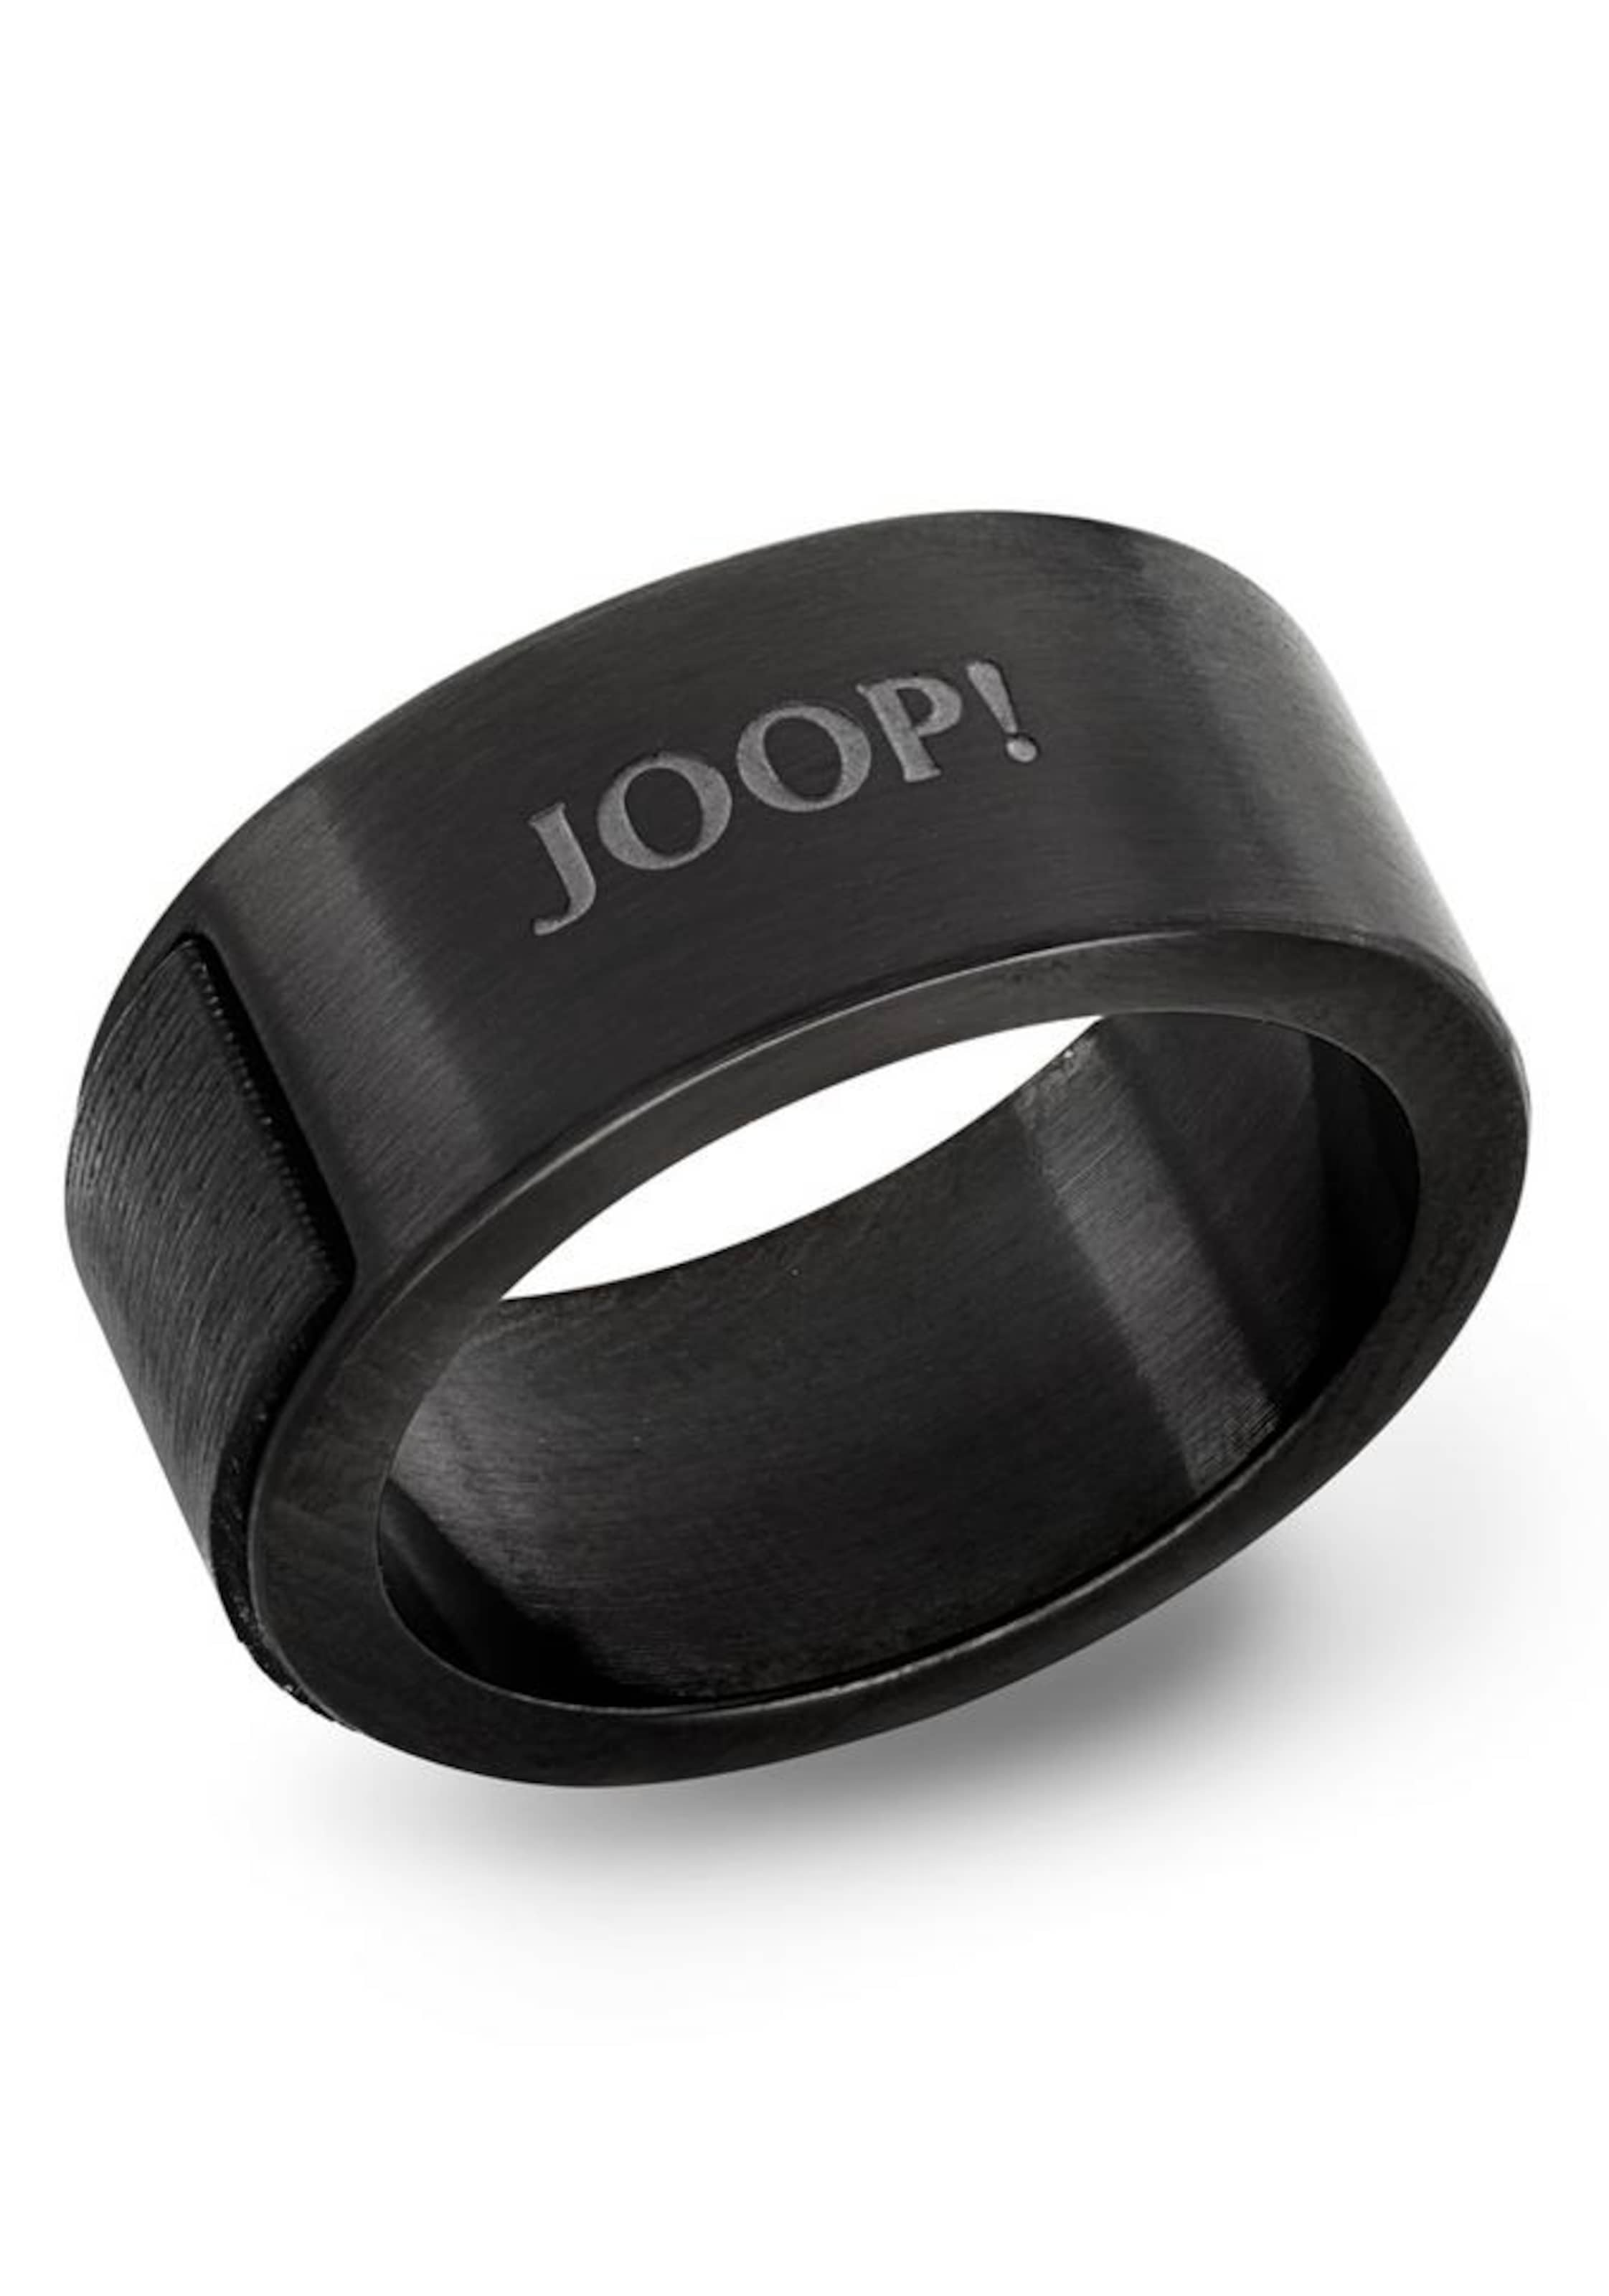 Schwarz JoopFingerring '202342920234322023433' Schwarz JoopFingerring JoopFingerring In In '202342920234322023433' qMVGSpUz